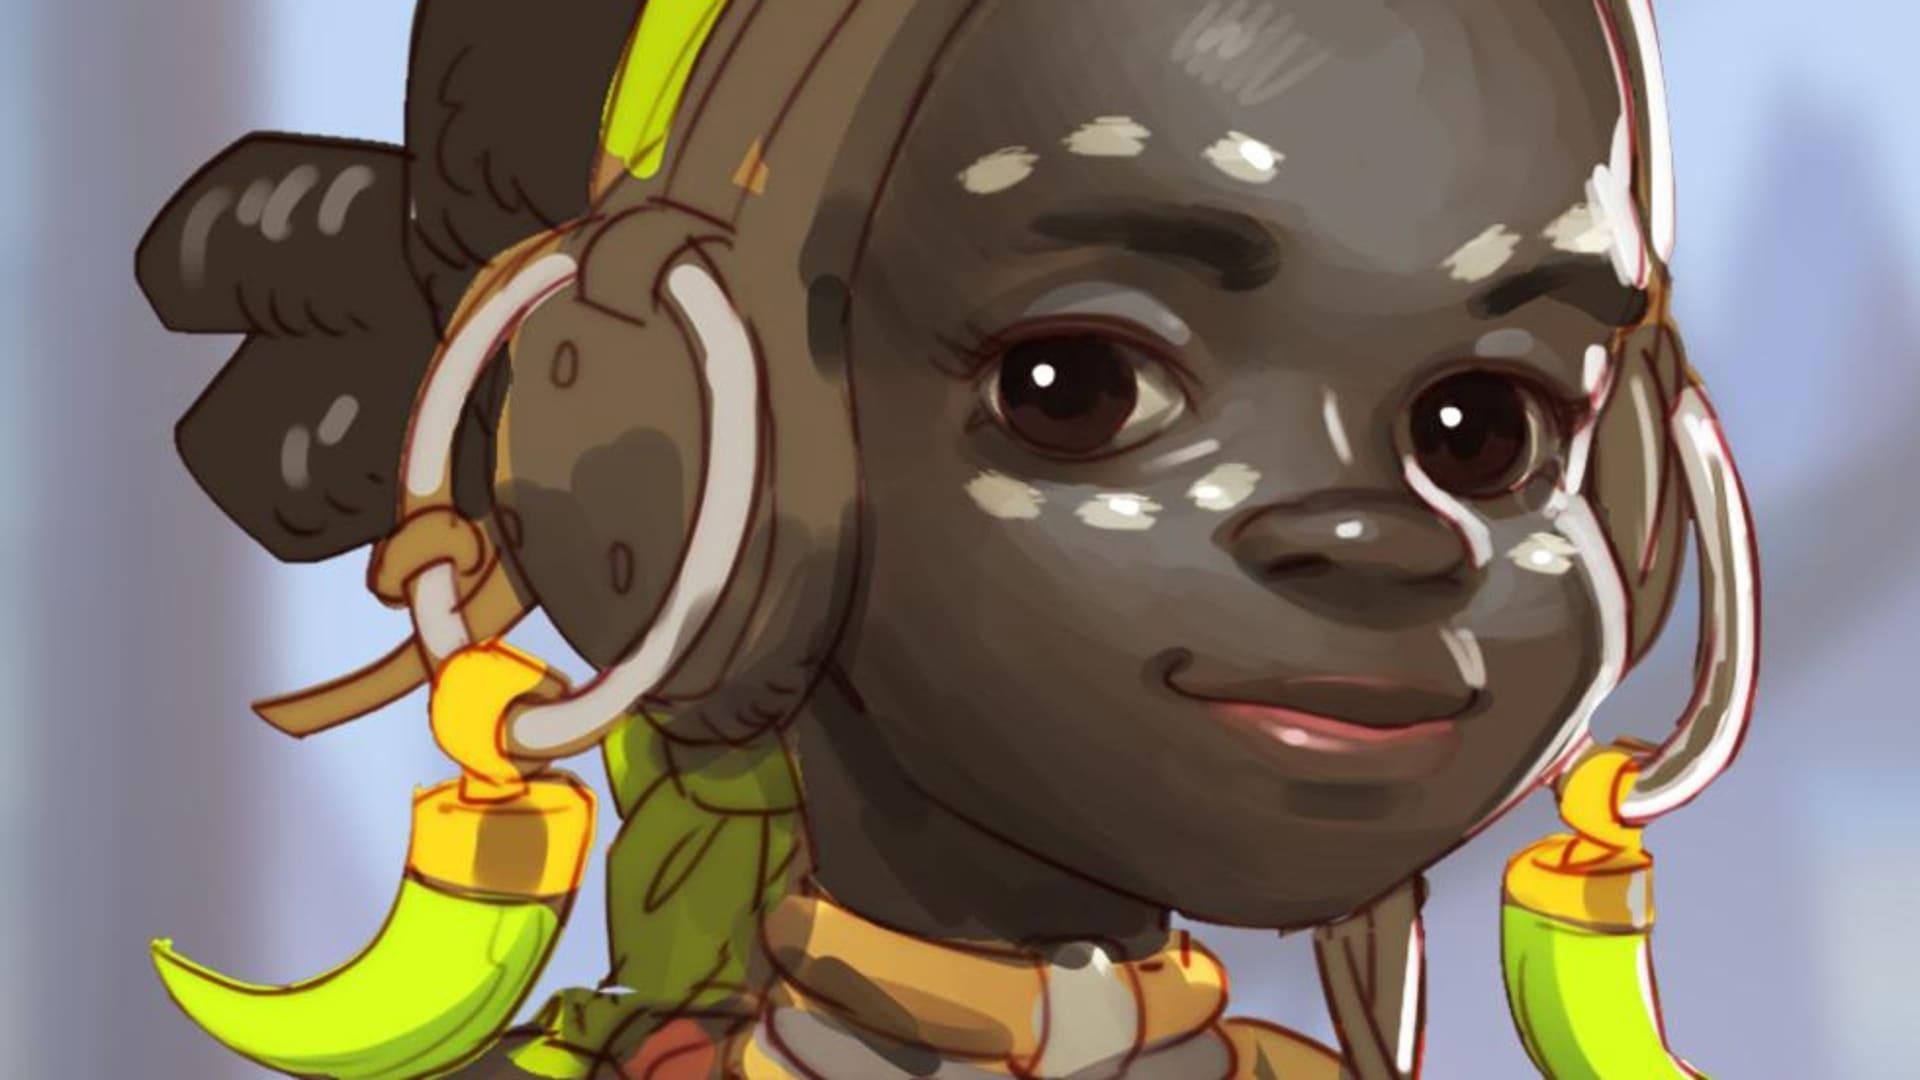 Nästa Overwatch-hjälte – en robottokig flicka?